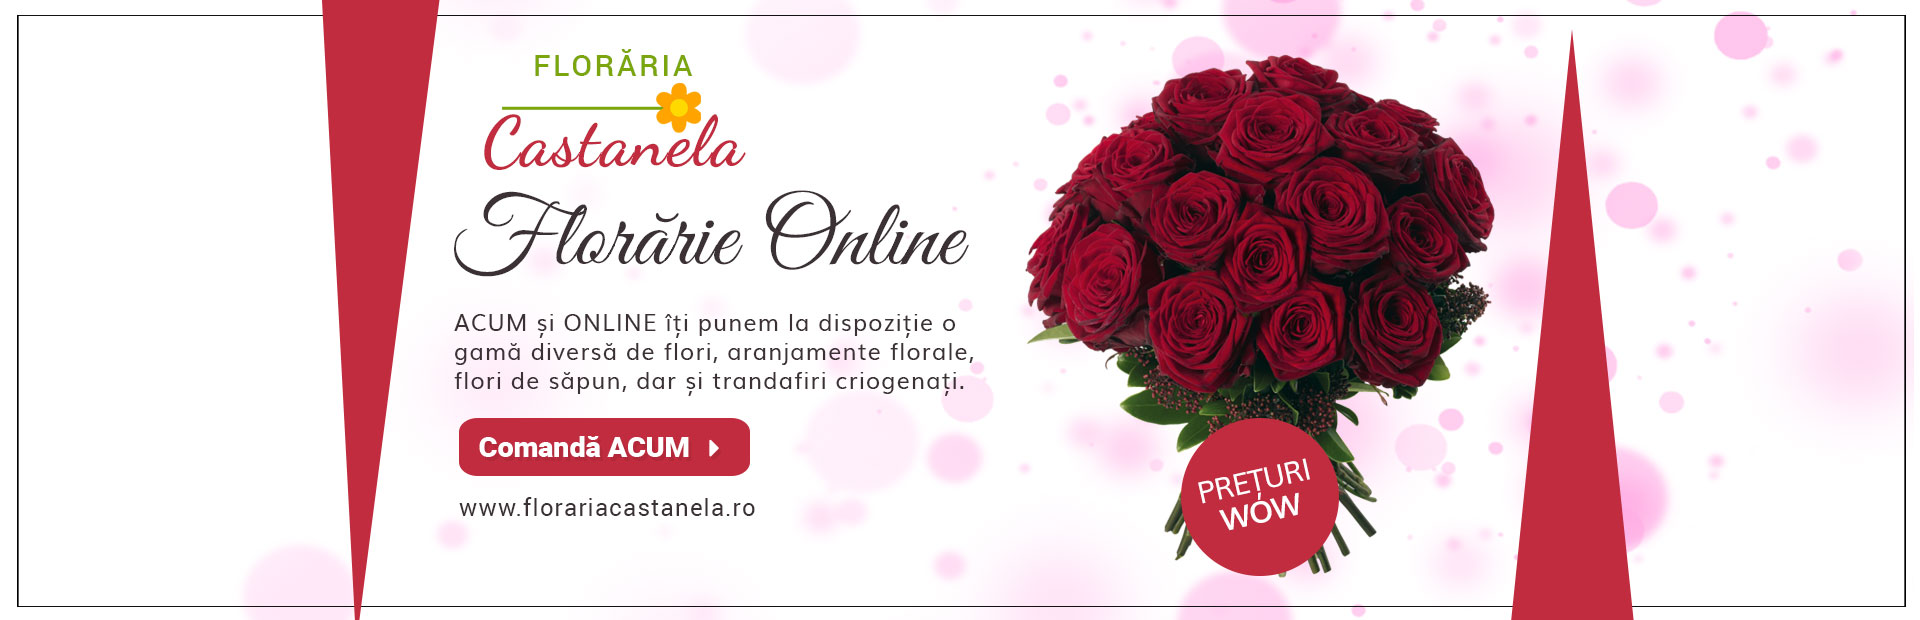 Banner-Floraria-Castanela